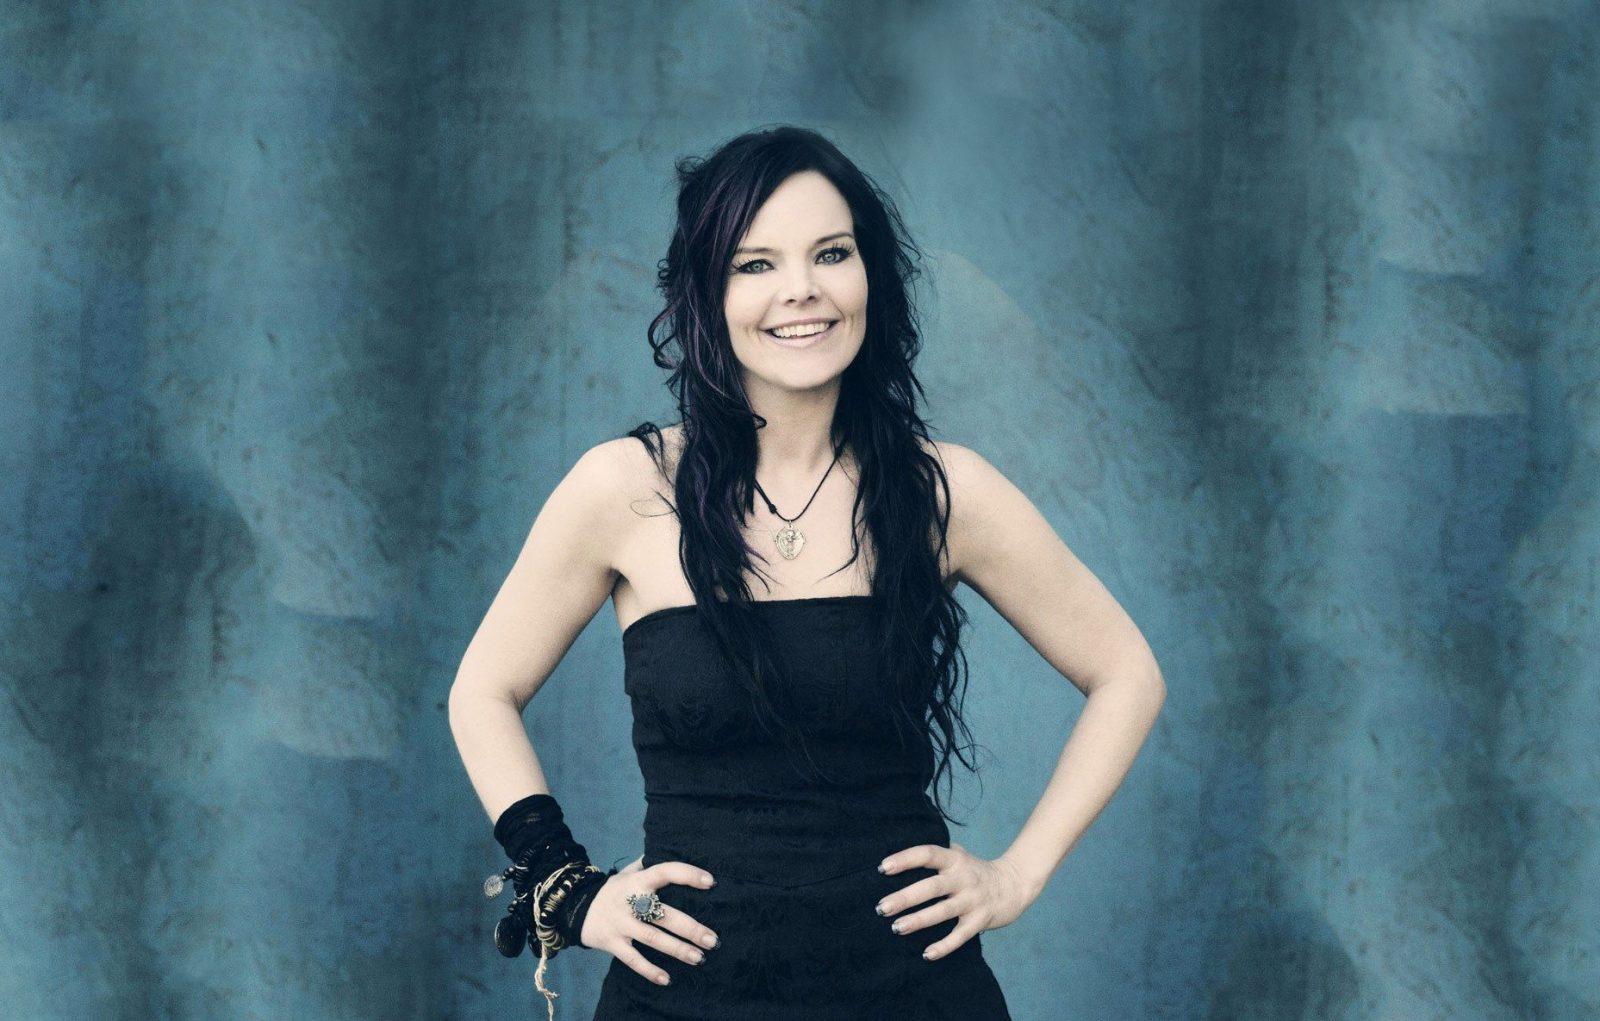 Anette Olzon - Nightwish - Alyson Avenue - The Dark Element